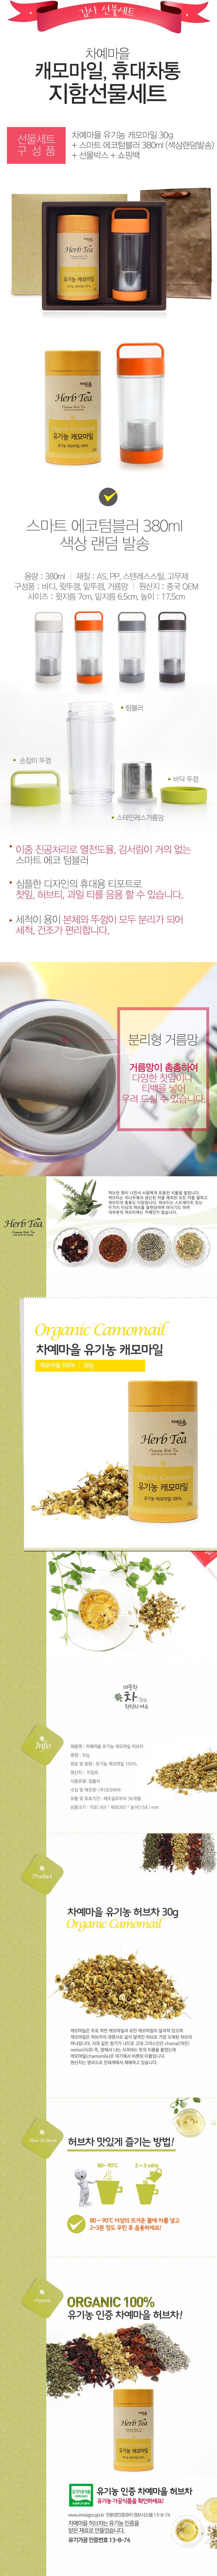 [ WongisinchaupLimited ] [ChayeTown] Chamomile Portable Tea Caddy Carton PresentSet